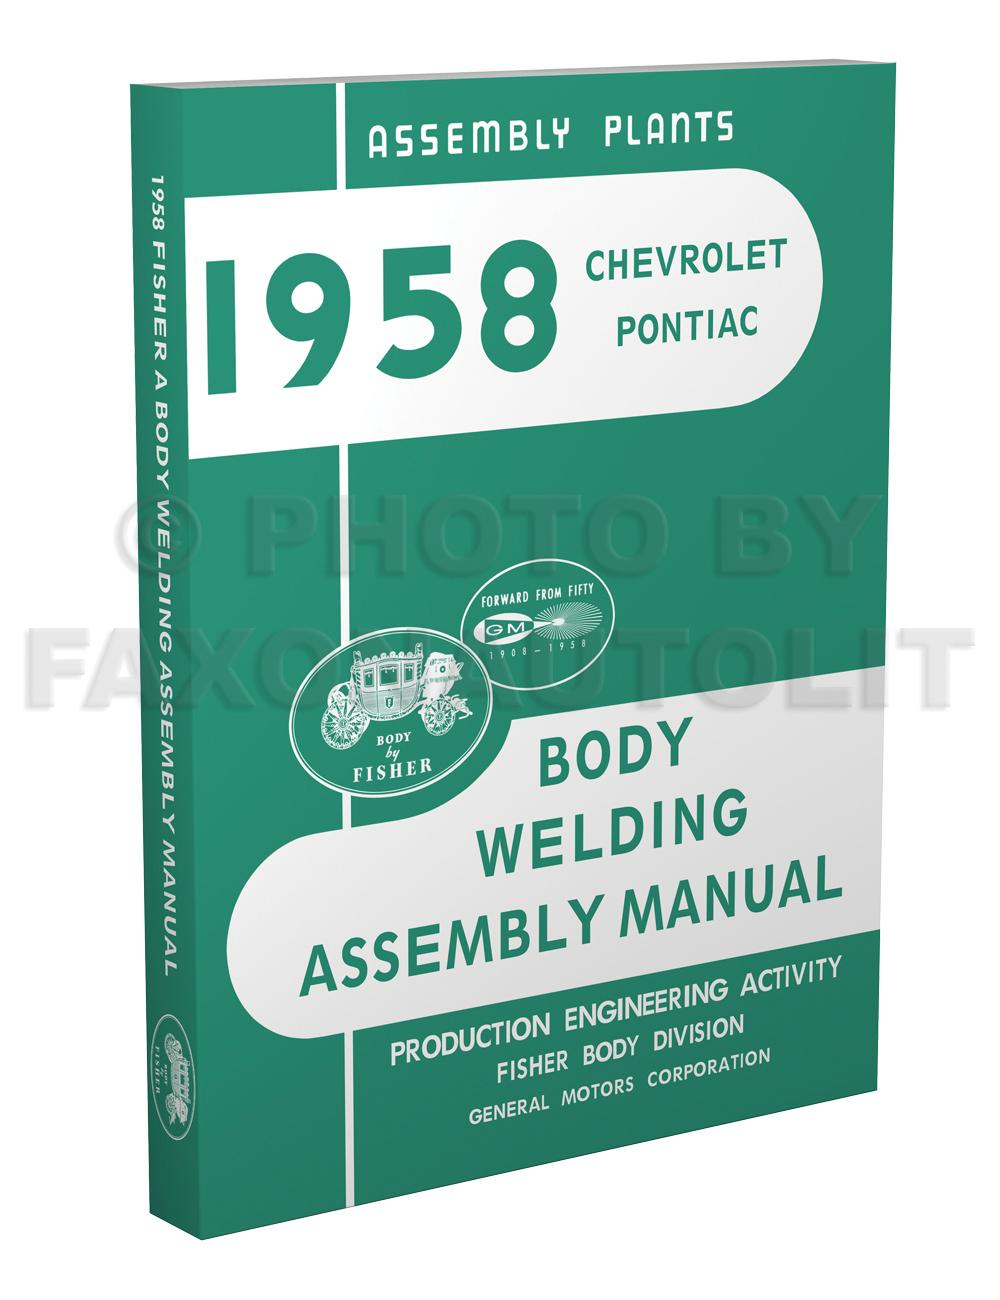 1958 fisher body welding assembly manual reprint chevrolet pontiac rh  faxonautoliterature com